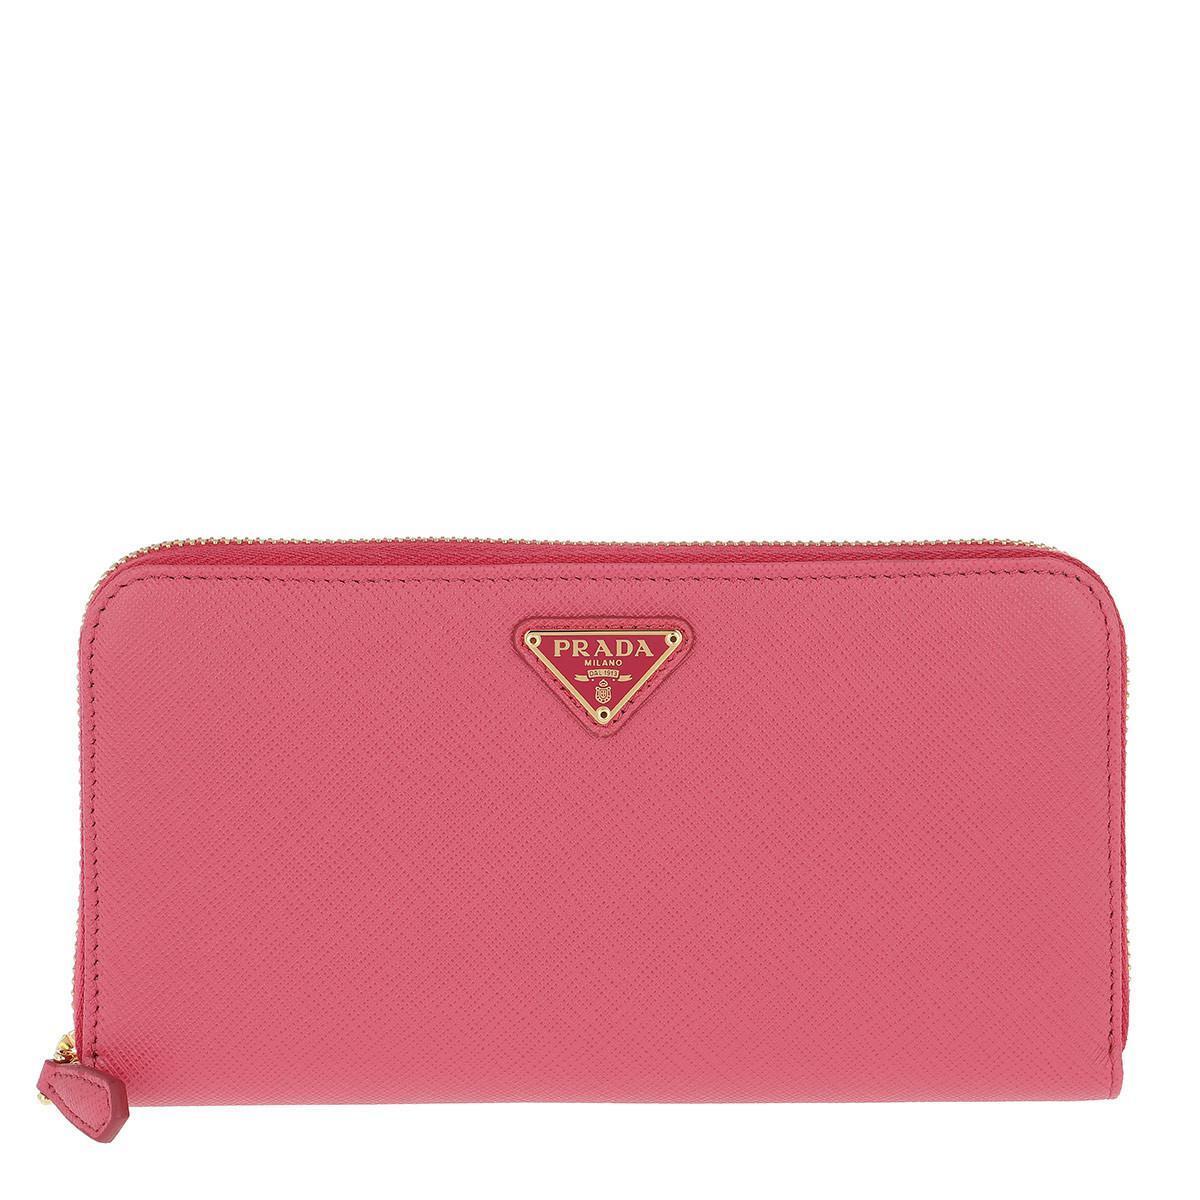 Wallets - Classic Zip Wallet Saffiano Leather Begonia - magenta - Wallets for ladies Prada uob7S